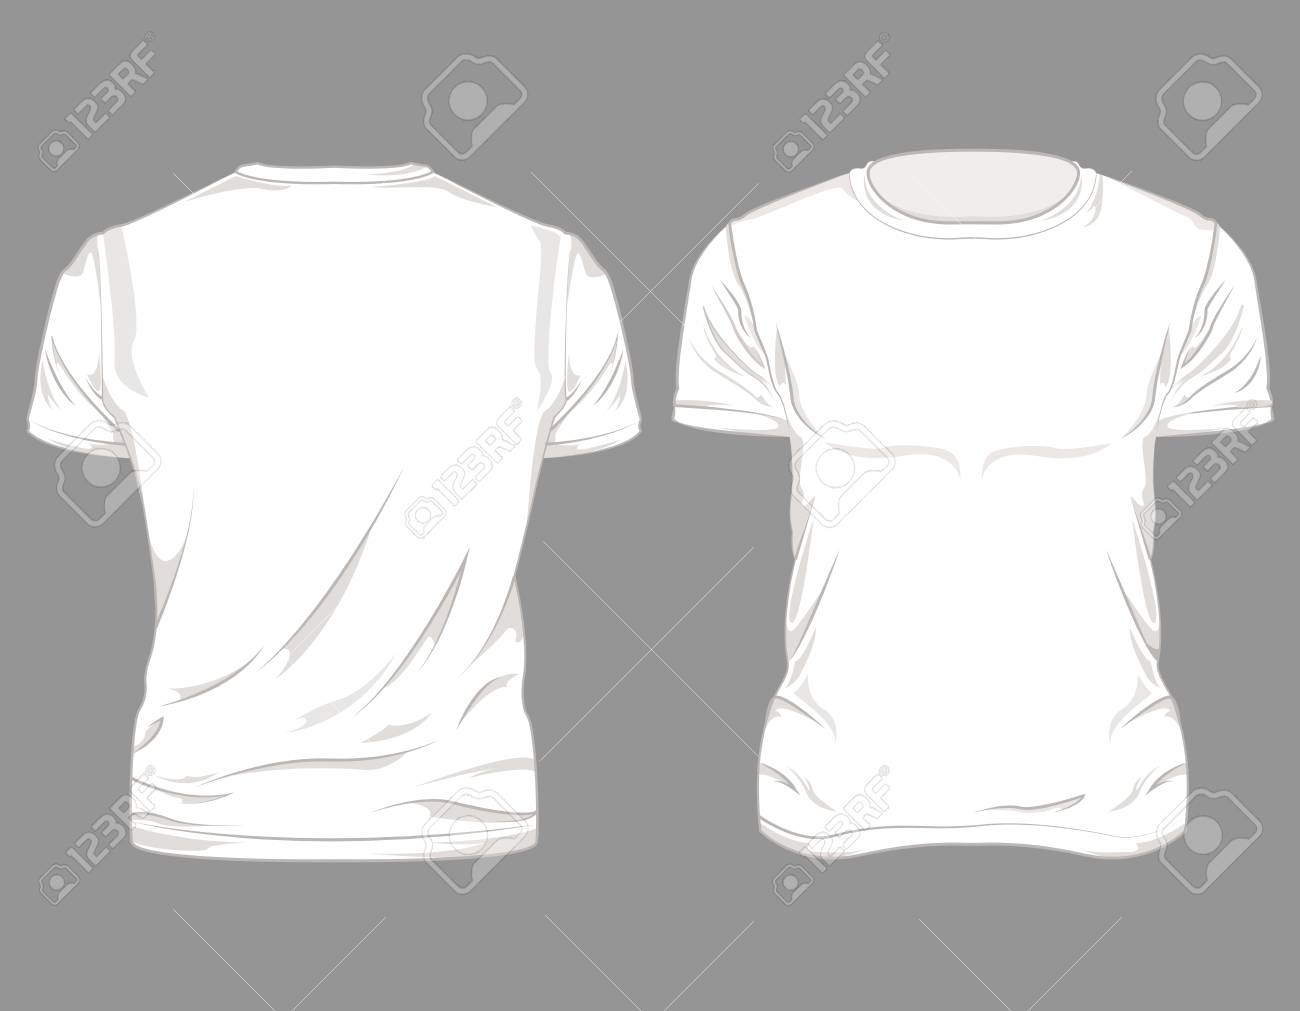 posterior masculina gris y frontal Camiseta fondo blanca sobre diseño dEQxeoCrBW